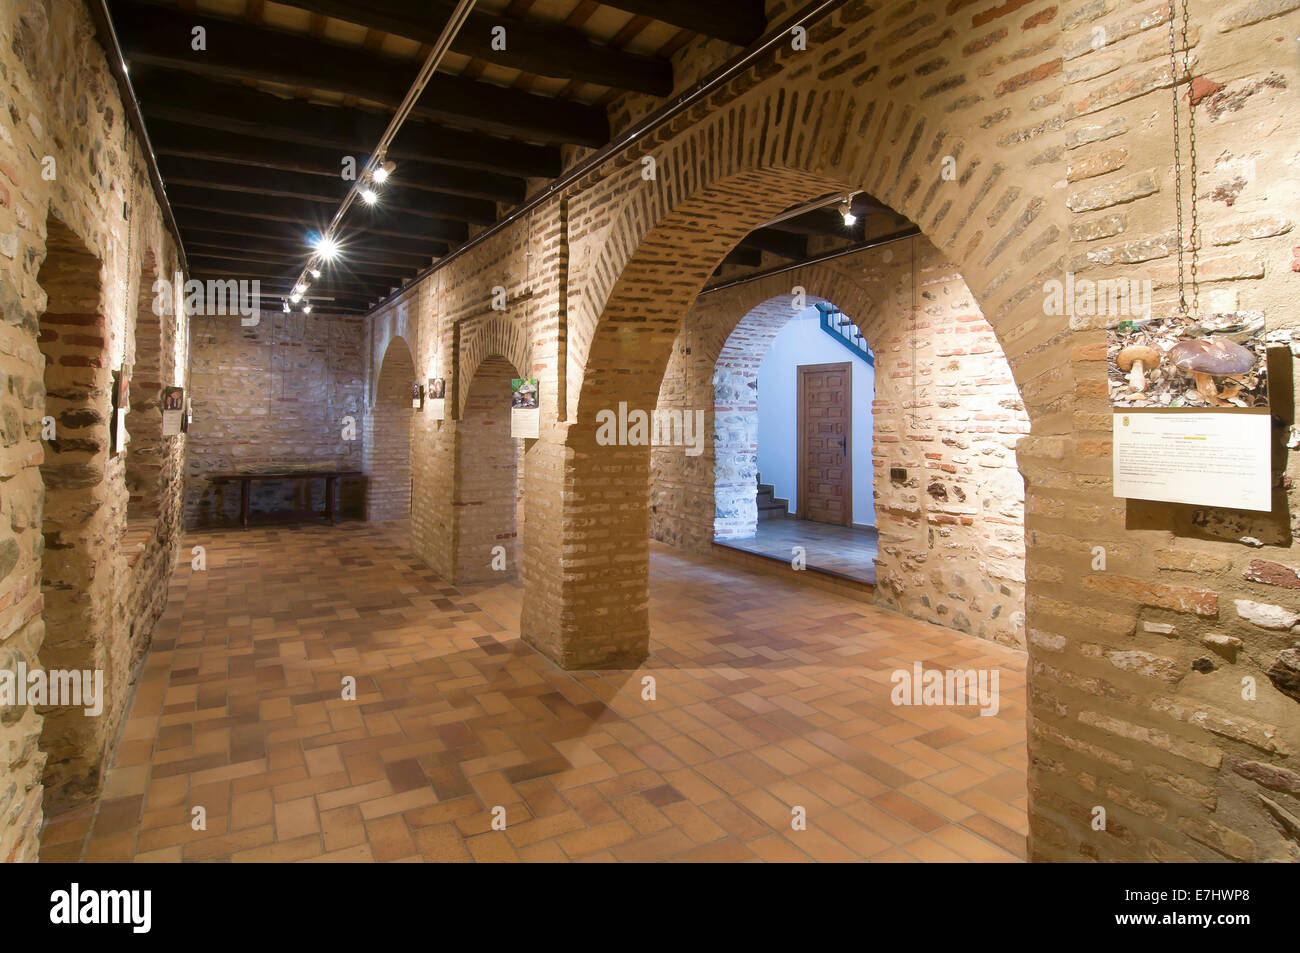 Mudejar room Museum-15th century, Town hall, La Redondela, Huelva province, Region of Andalusia, Spain, Europe - Stock Image